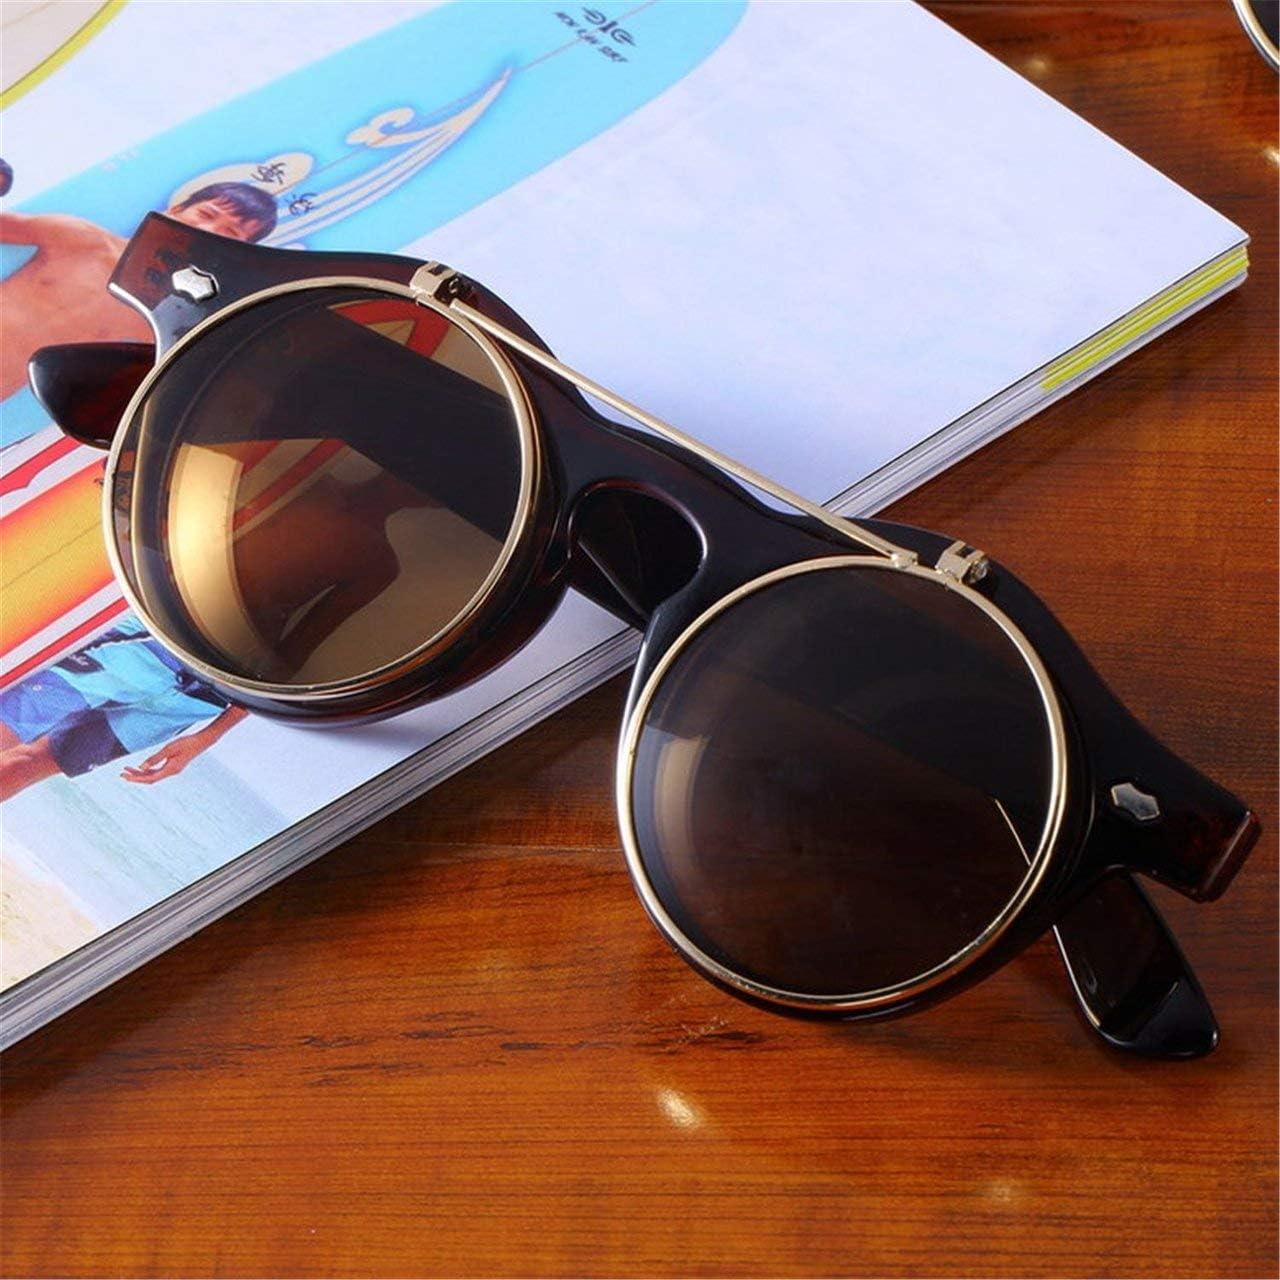 ESjasnyfall Gafas cl/ásicas Steampunk Goth Gafas Gafas de sol redondas plegables Retro Accesorios de moda vintage Tendencia de moda Gafas redondas Tawny